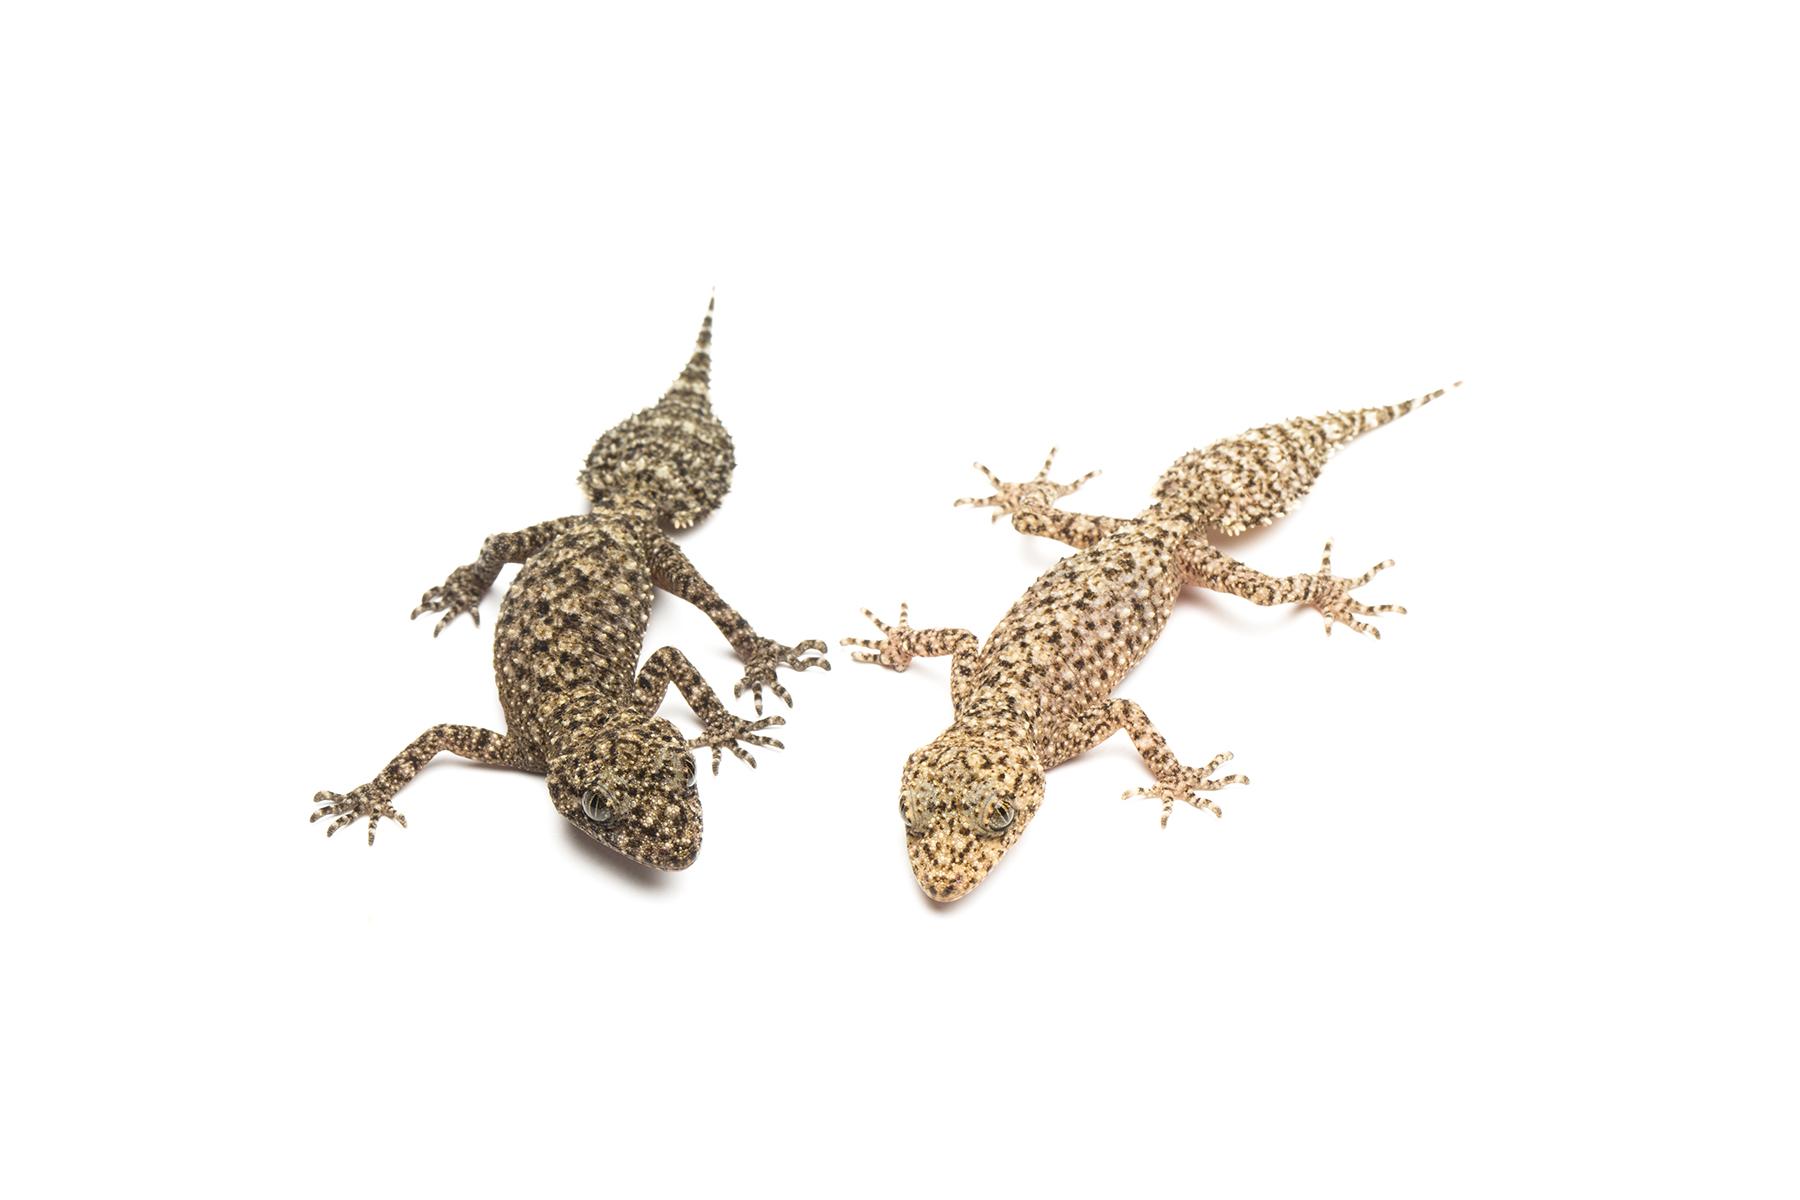 Hatchlings